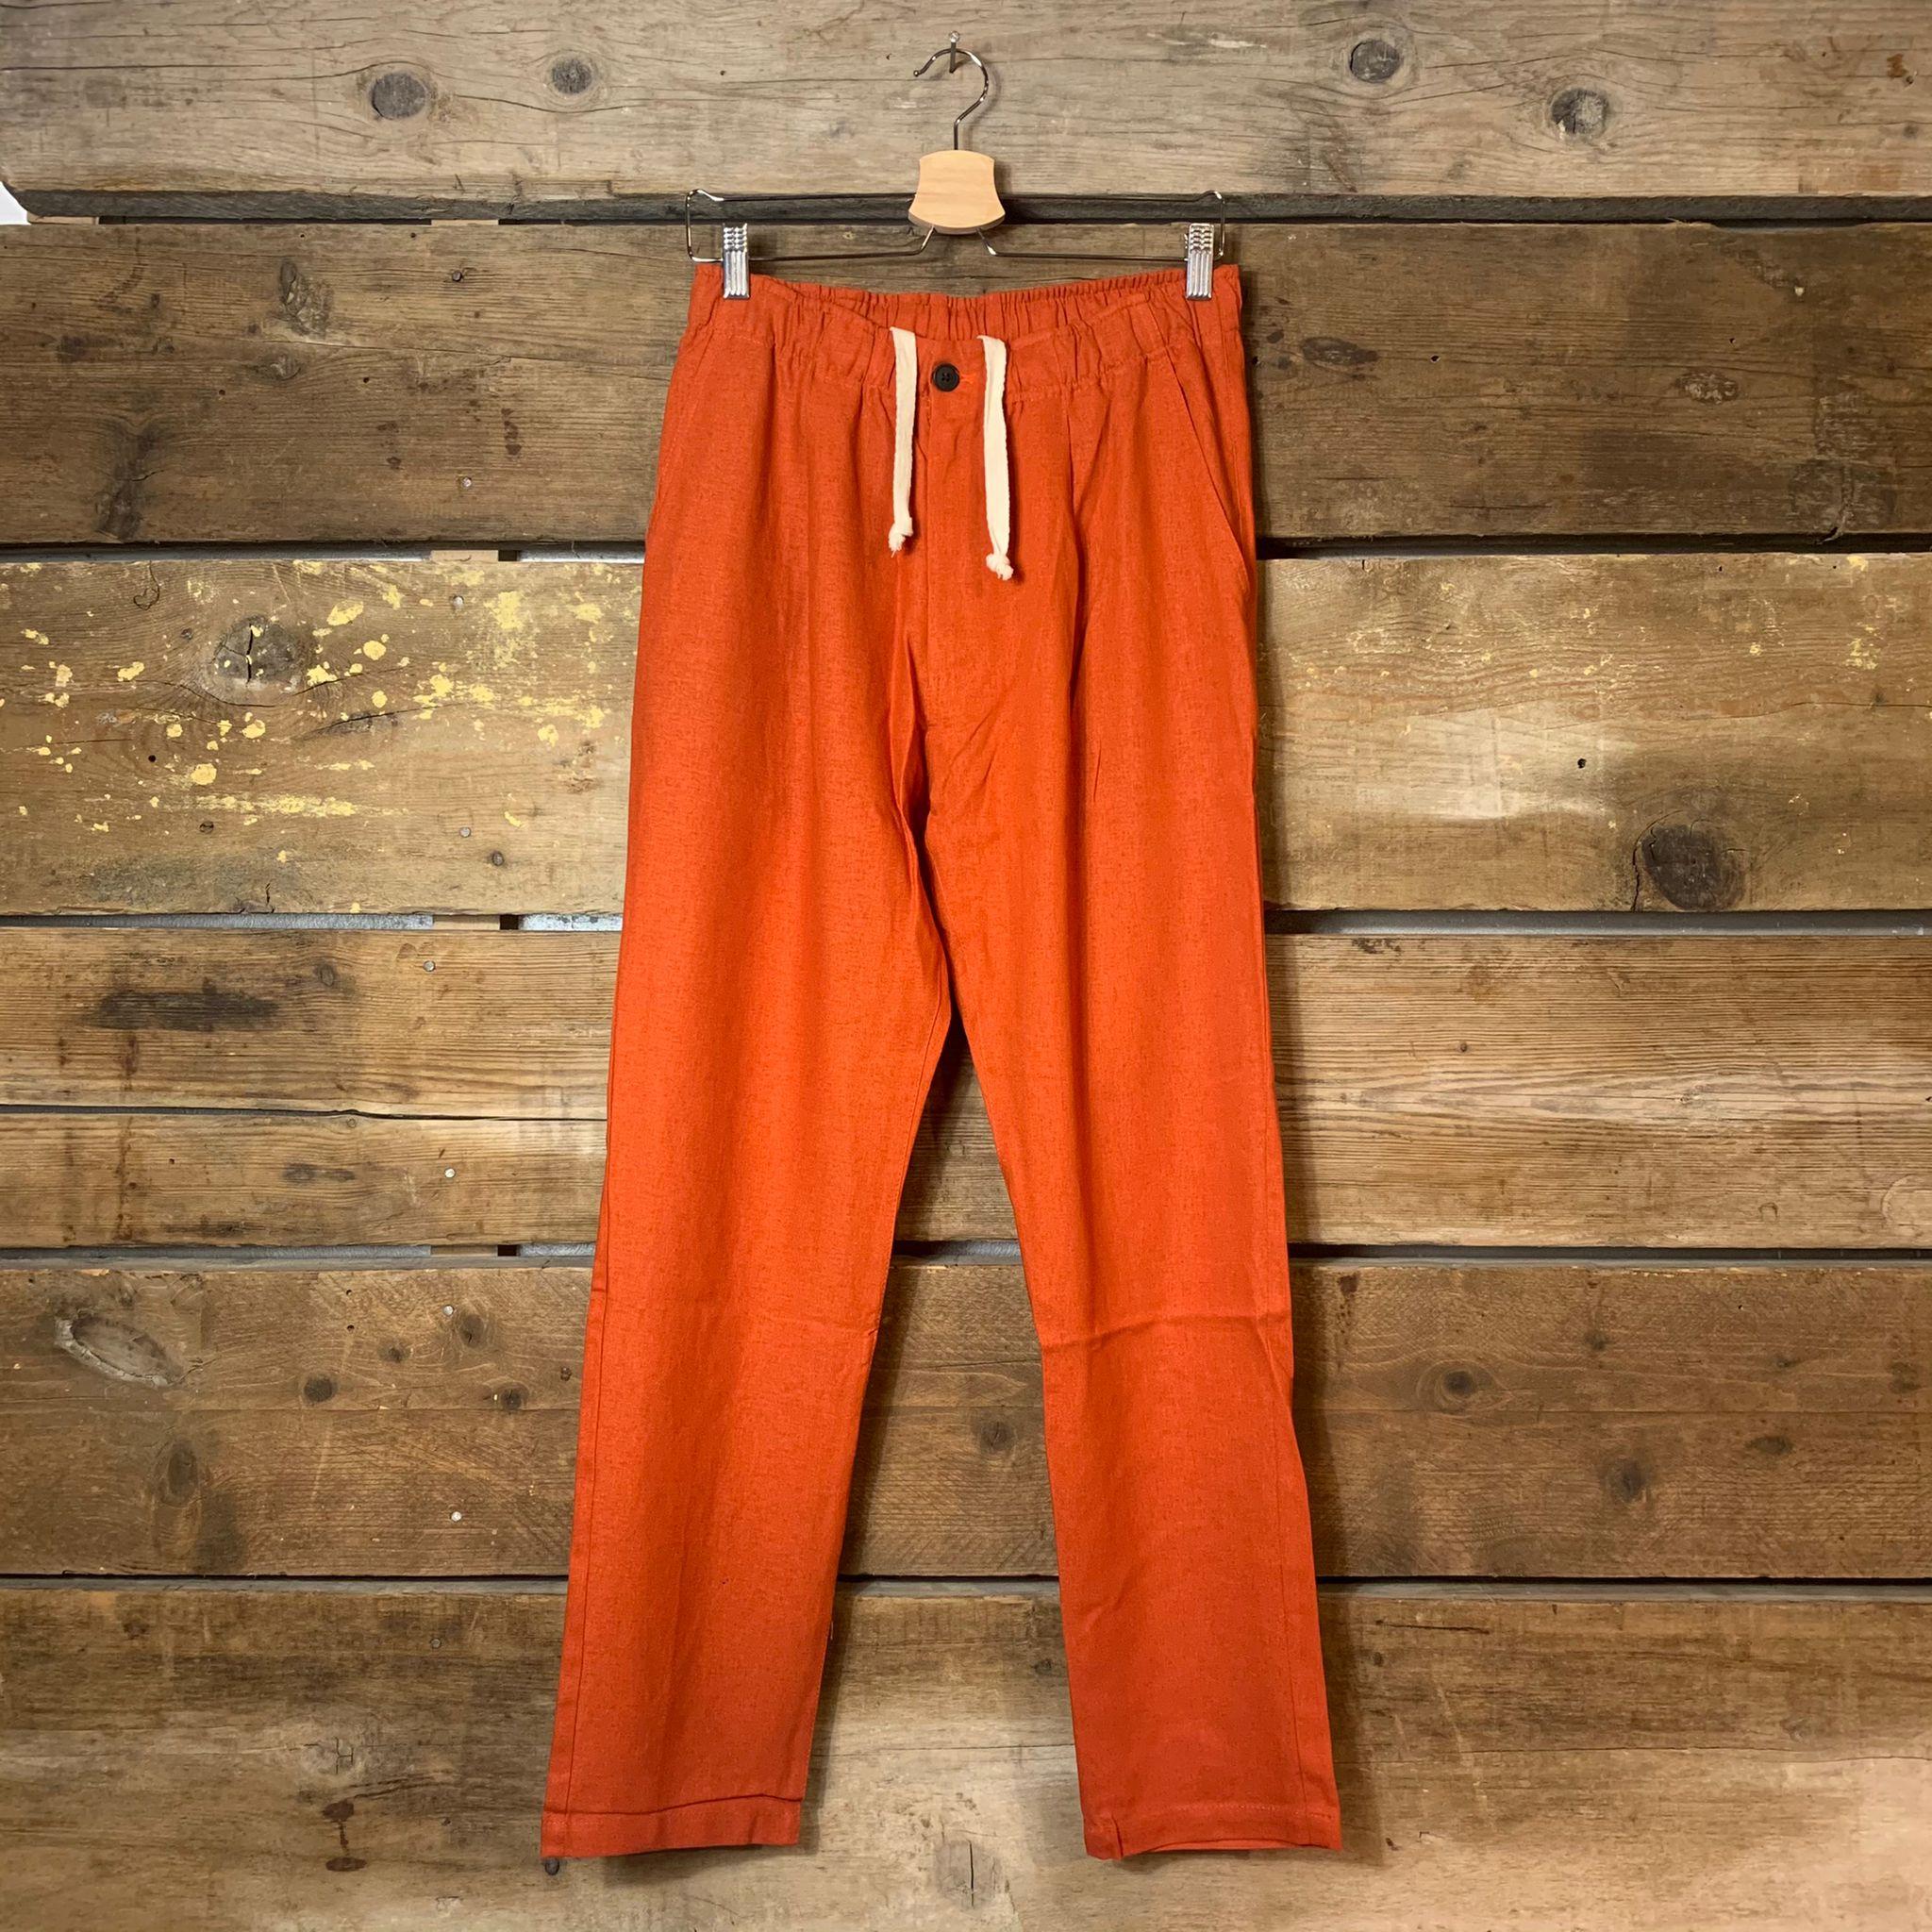 Pantalone Bakery Supply Lowan Porto Lucas in Lino Arancione